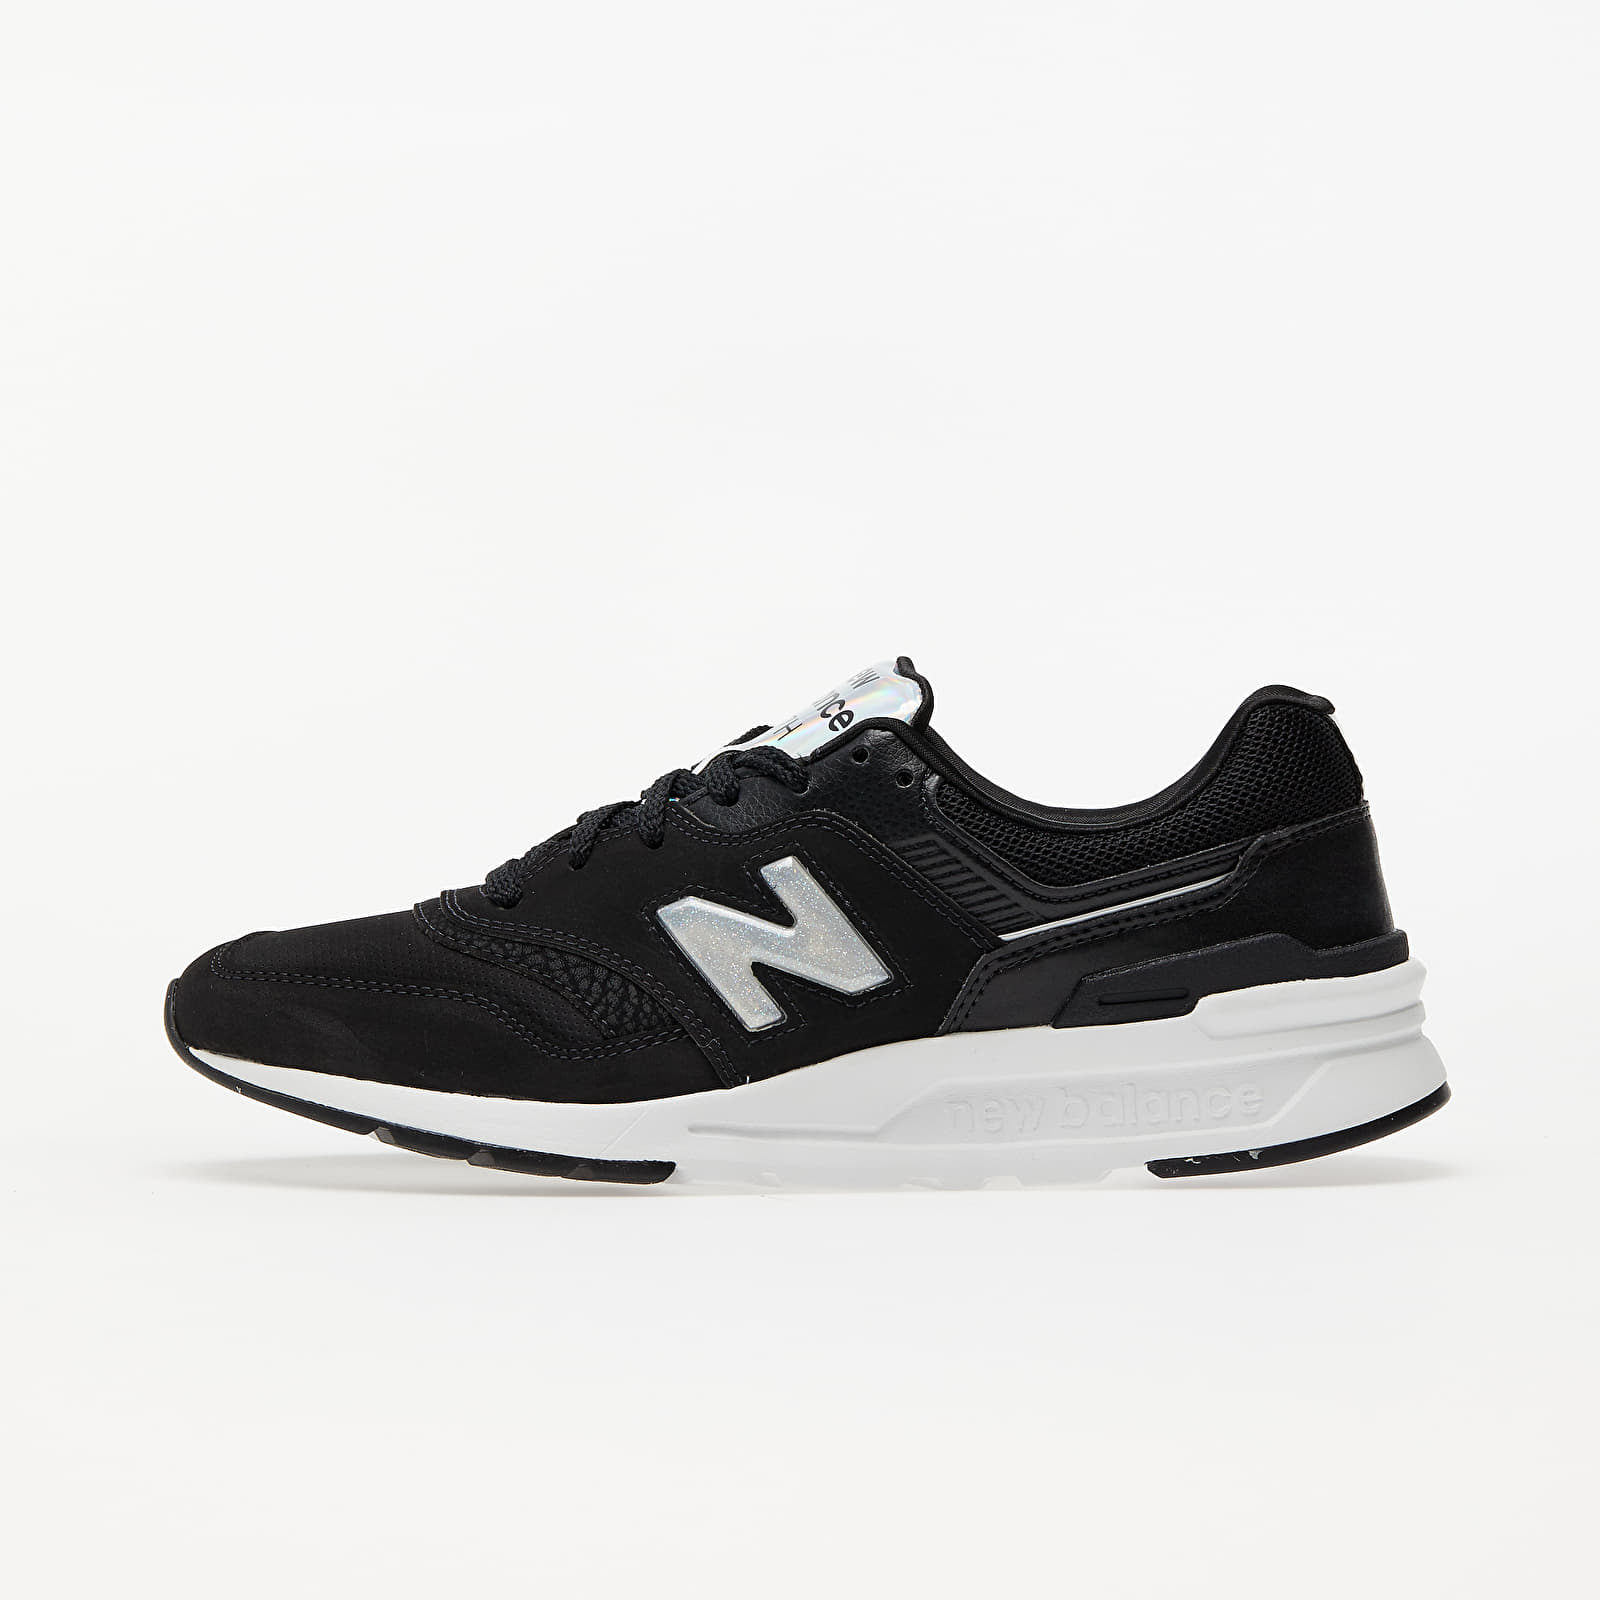 New Balance 997 Black EUR 40